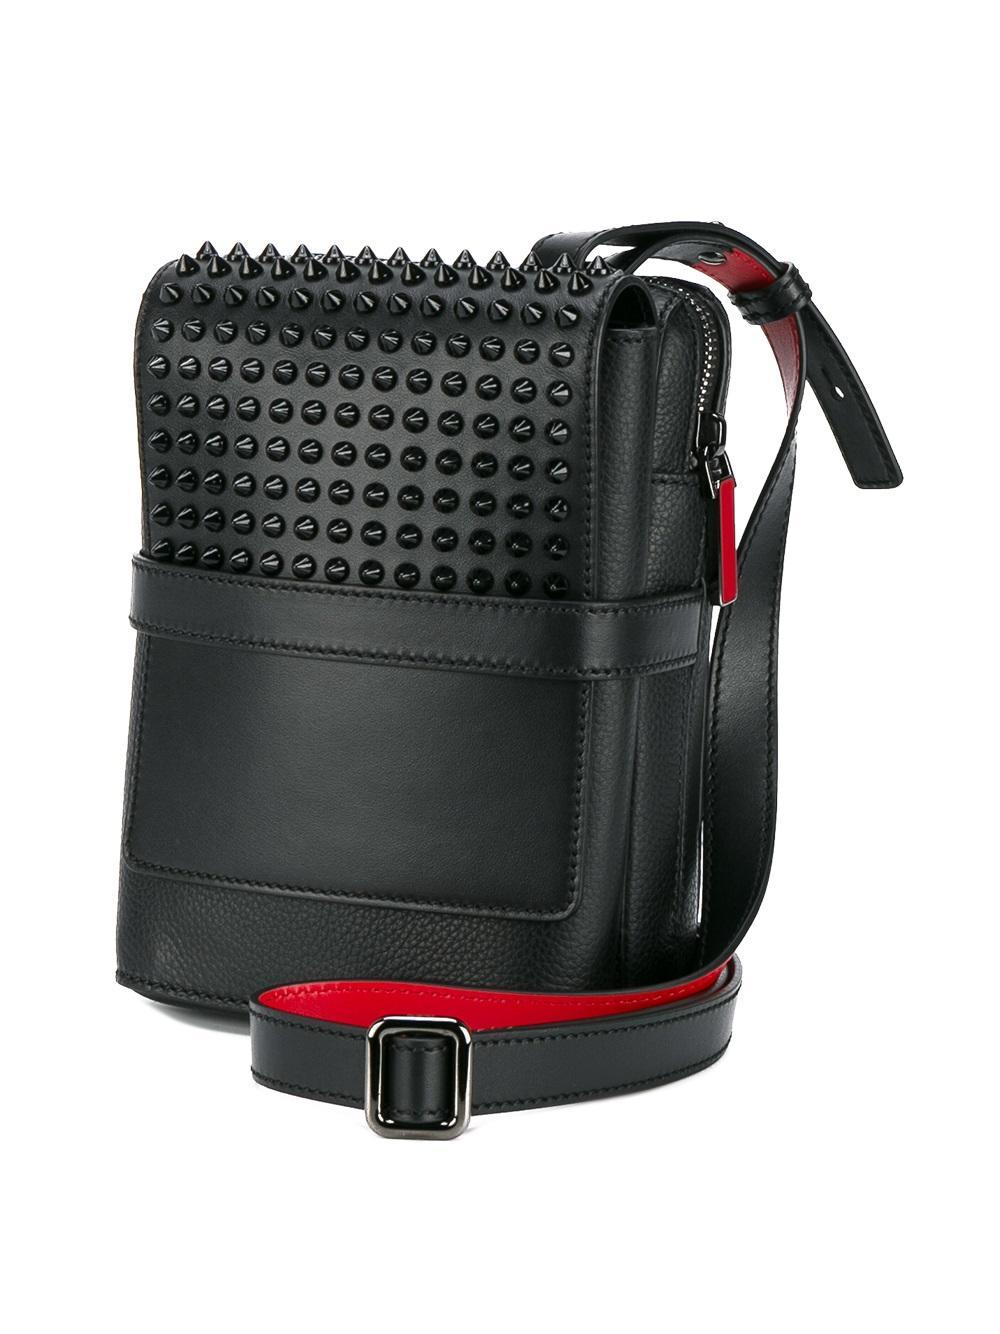 Christian Louboutin Spiked Reporter Bag In Black For Men